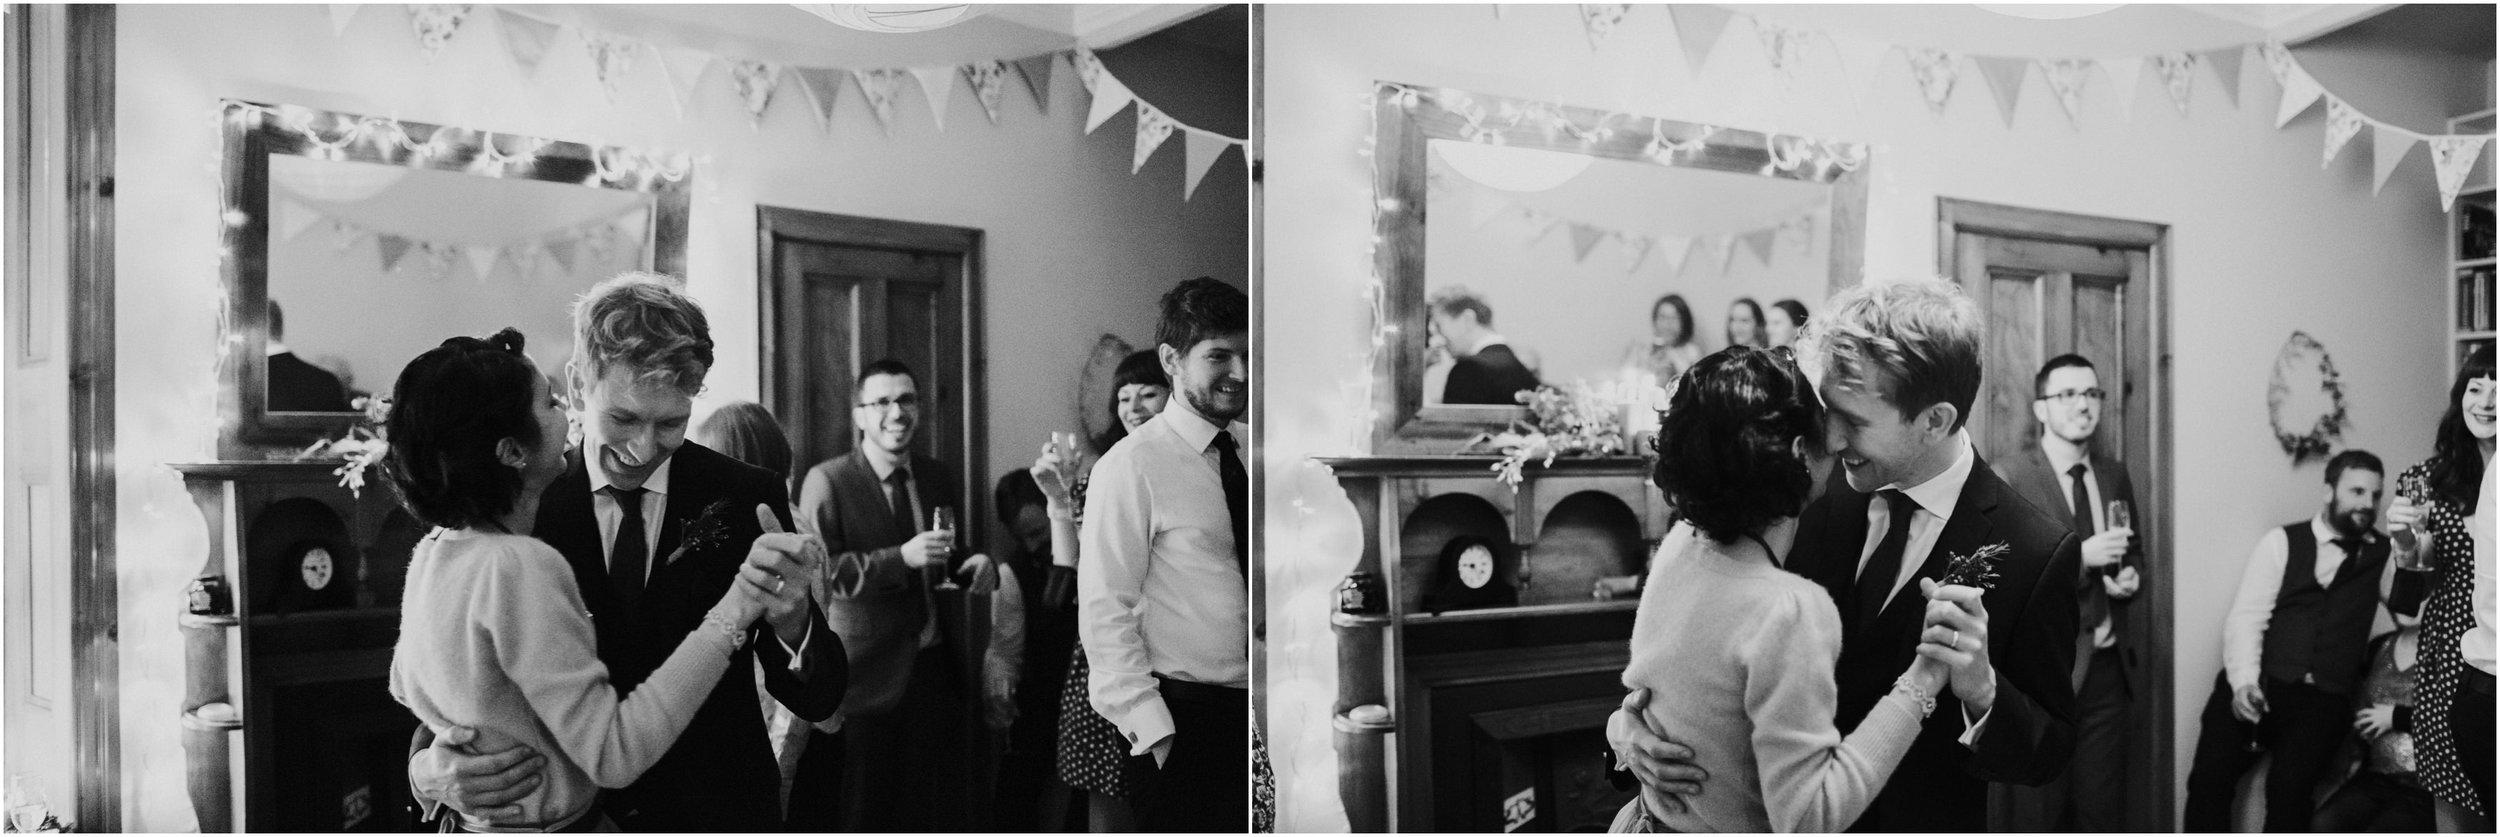 Photography 78 - Glasgow Wedding Photographer - Mike & Karol - Ubiquitous Chip Ashton Lane_0072.jpg